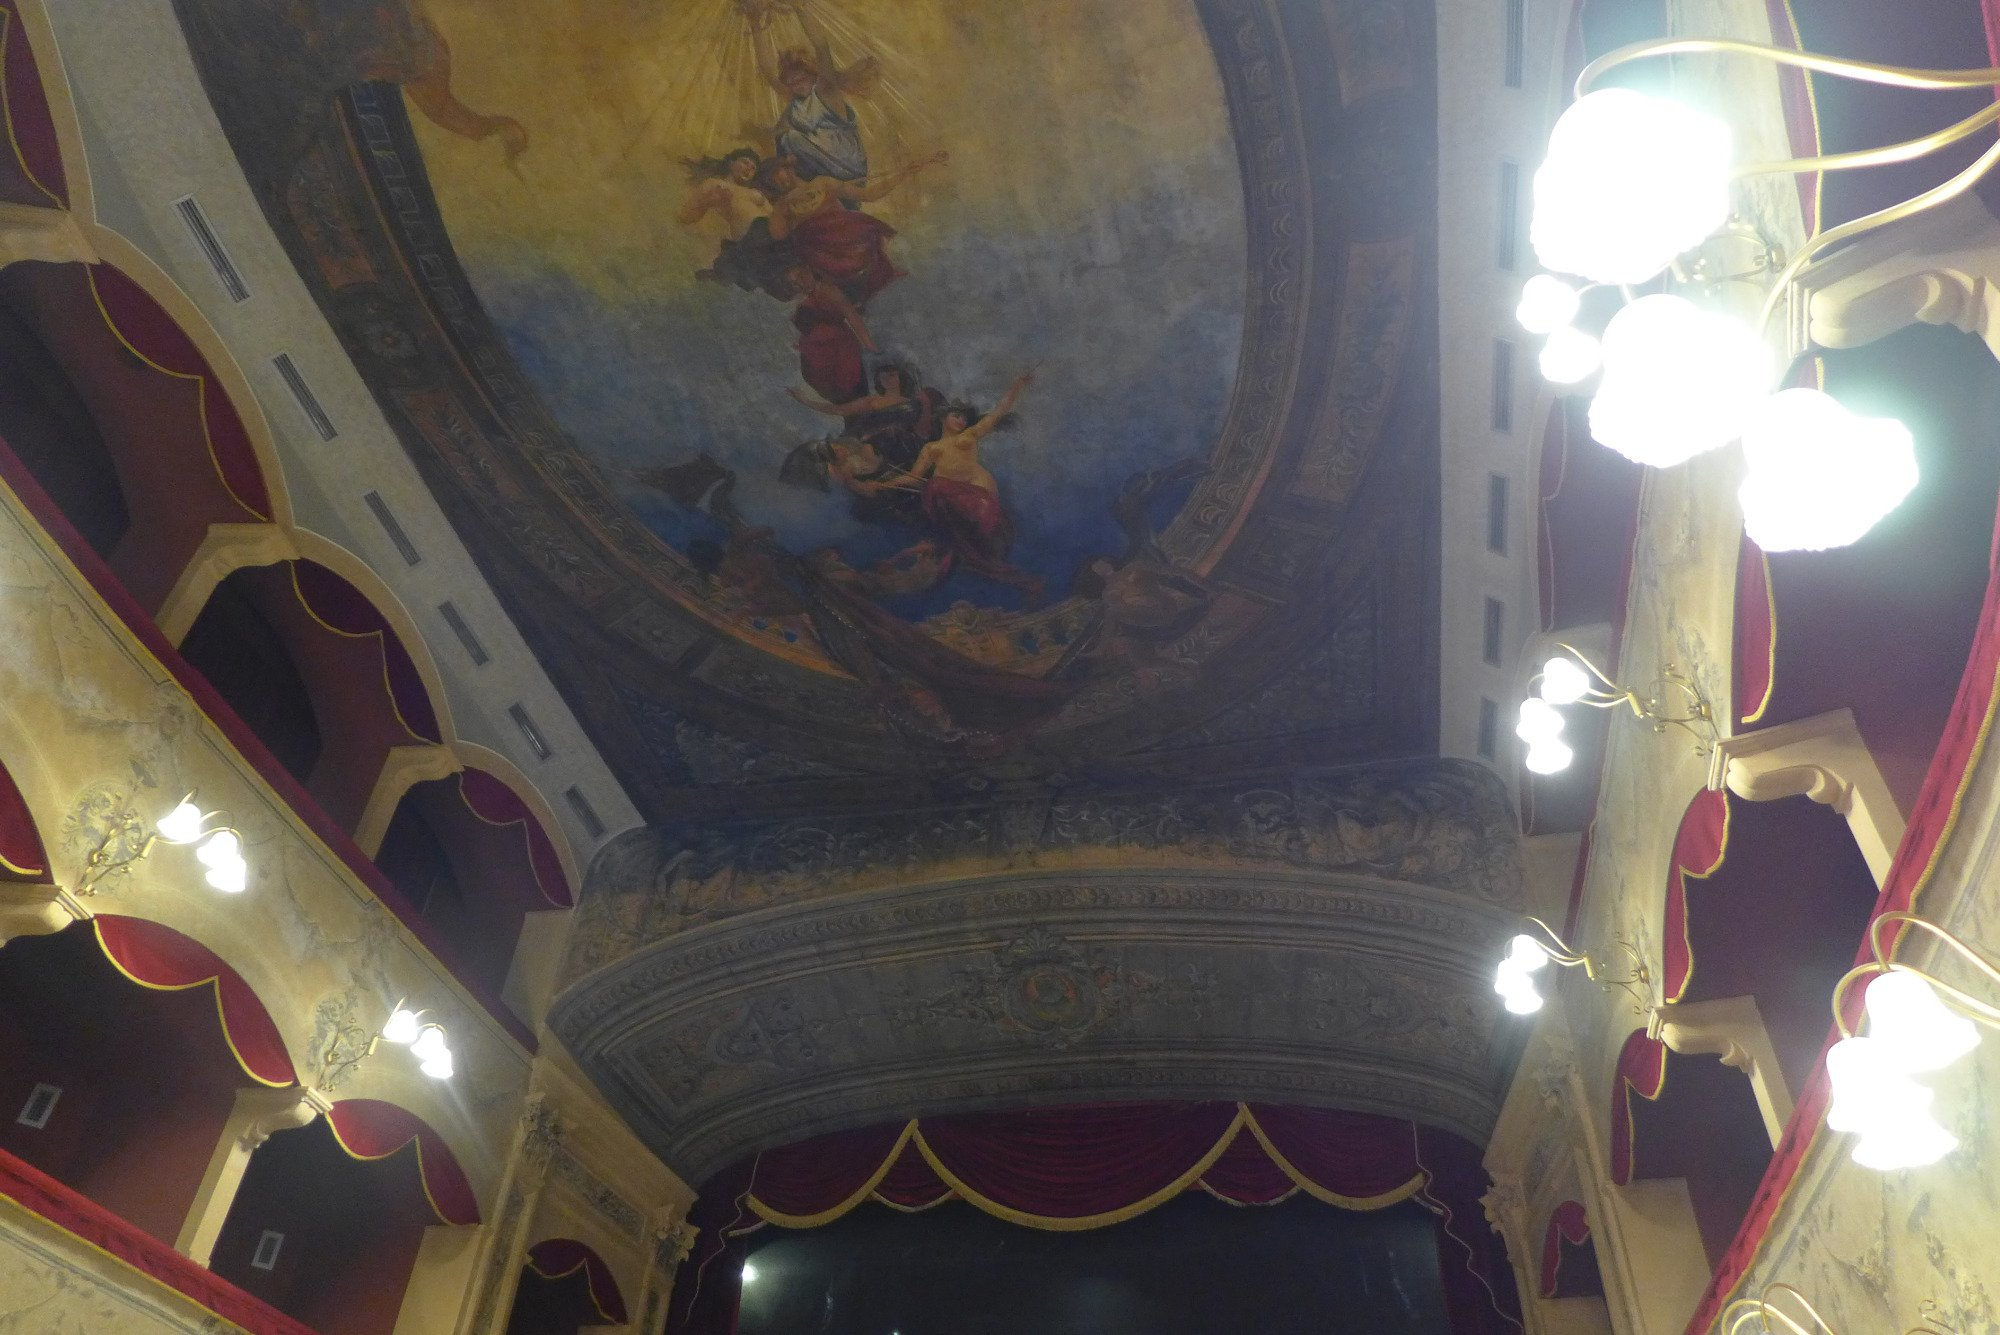 Teatro Comunale S. Cicero